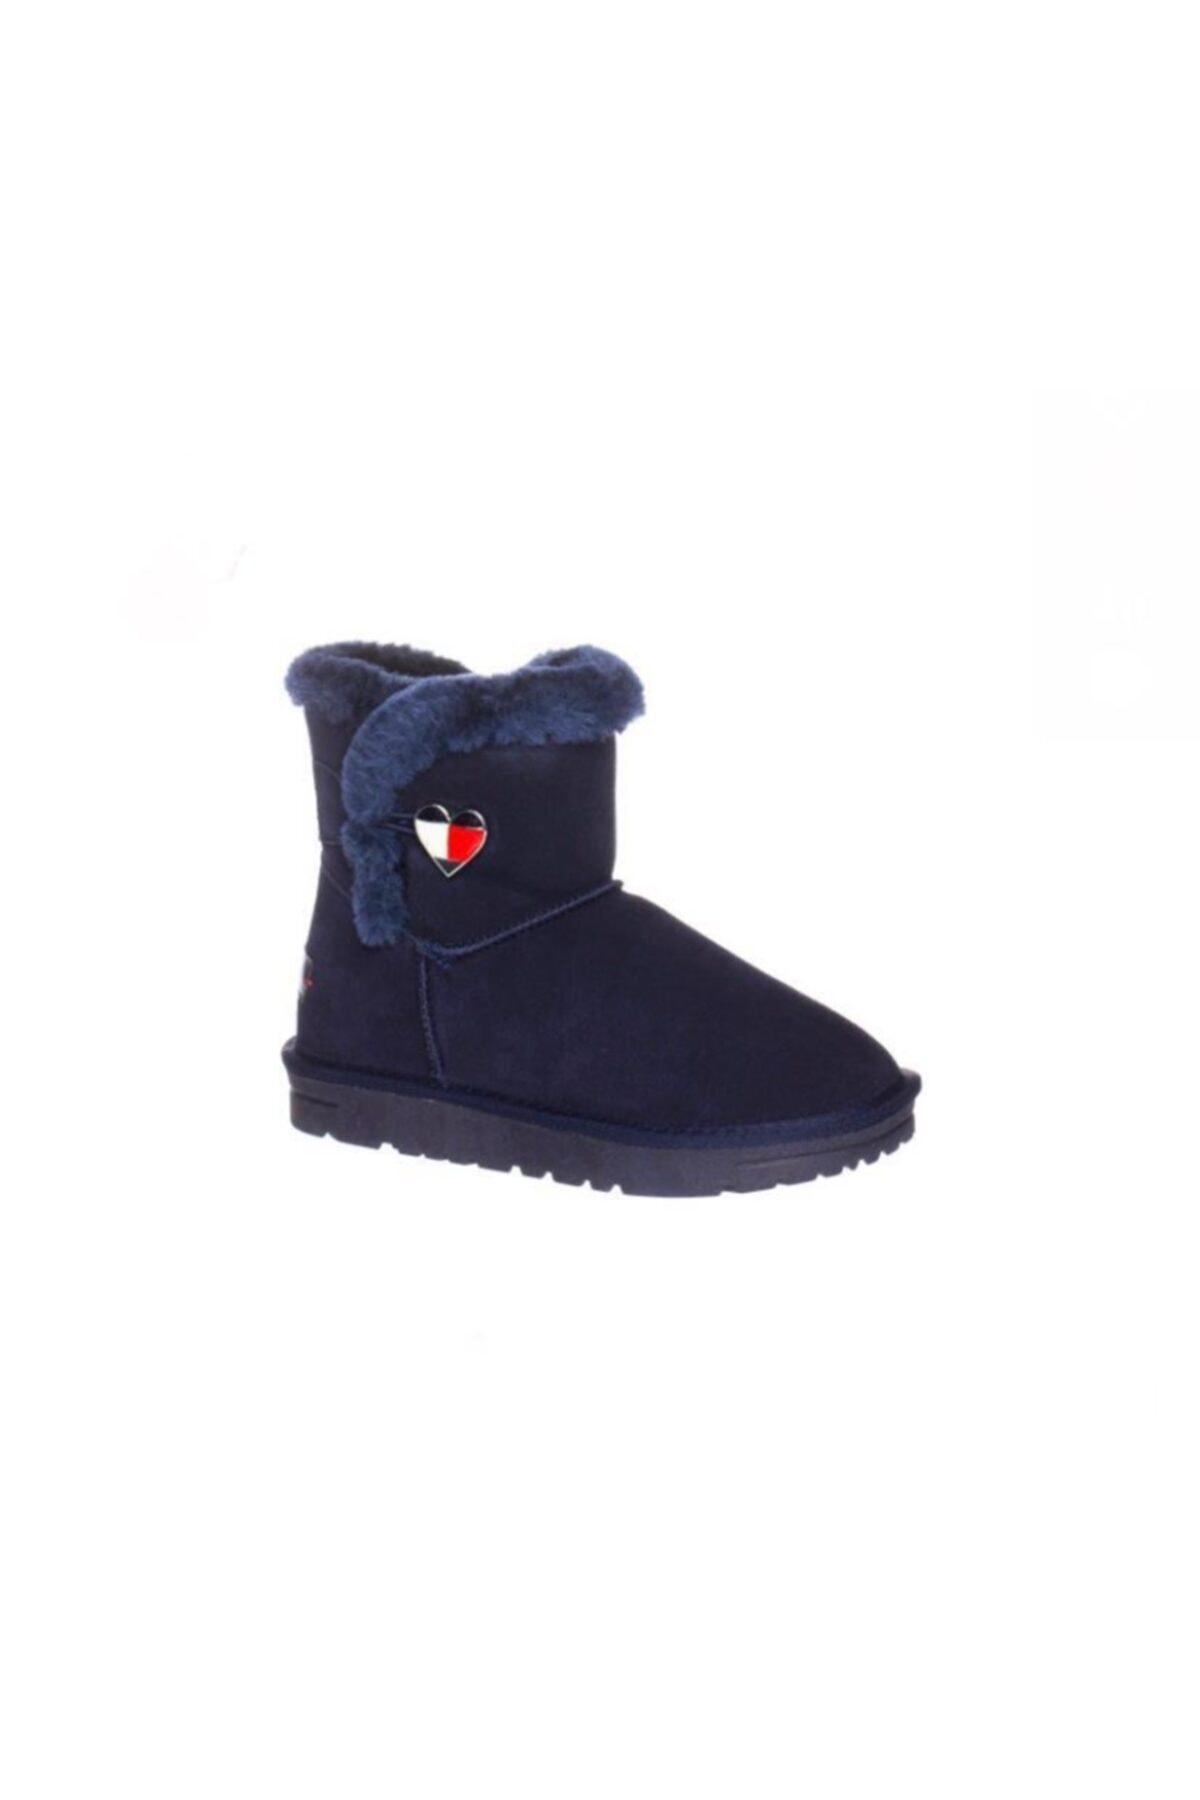 Tommy Hilfiger Blue Fur Boot 1